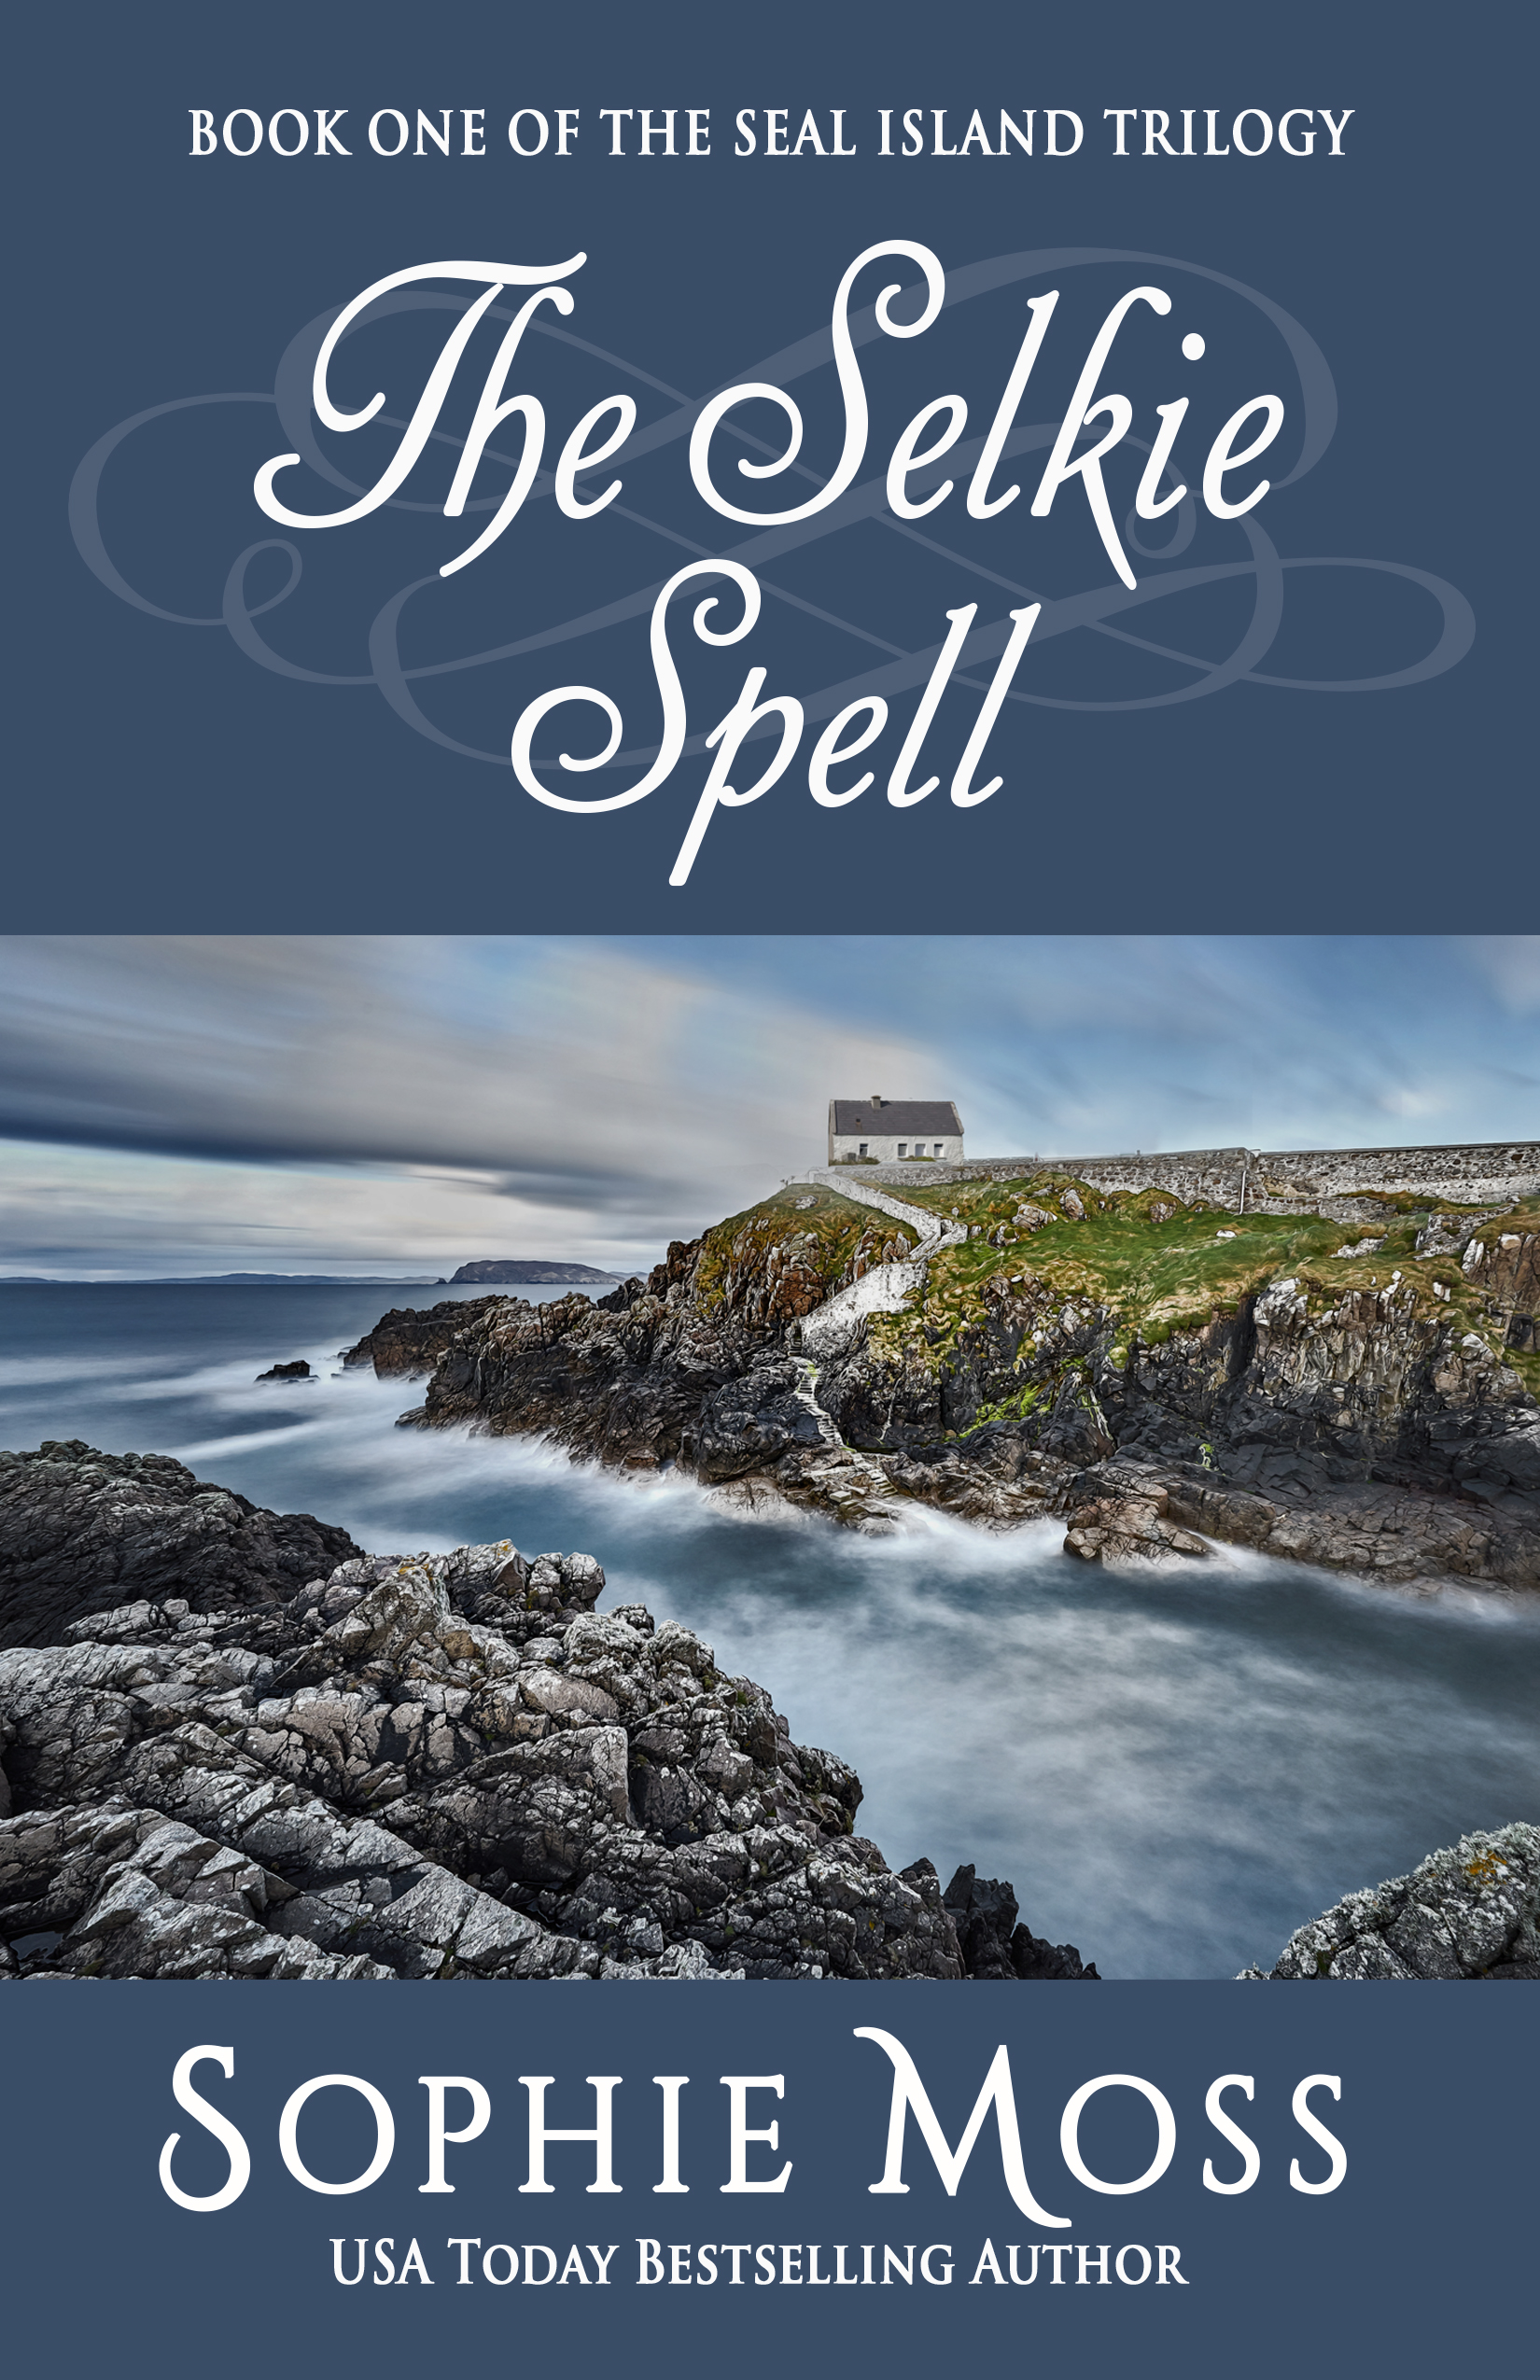 The Selkie Spell ebook cover Aug 14 2017 VELLUM.jpg